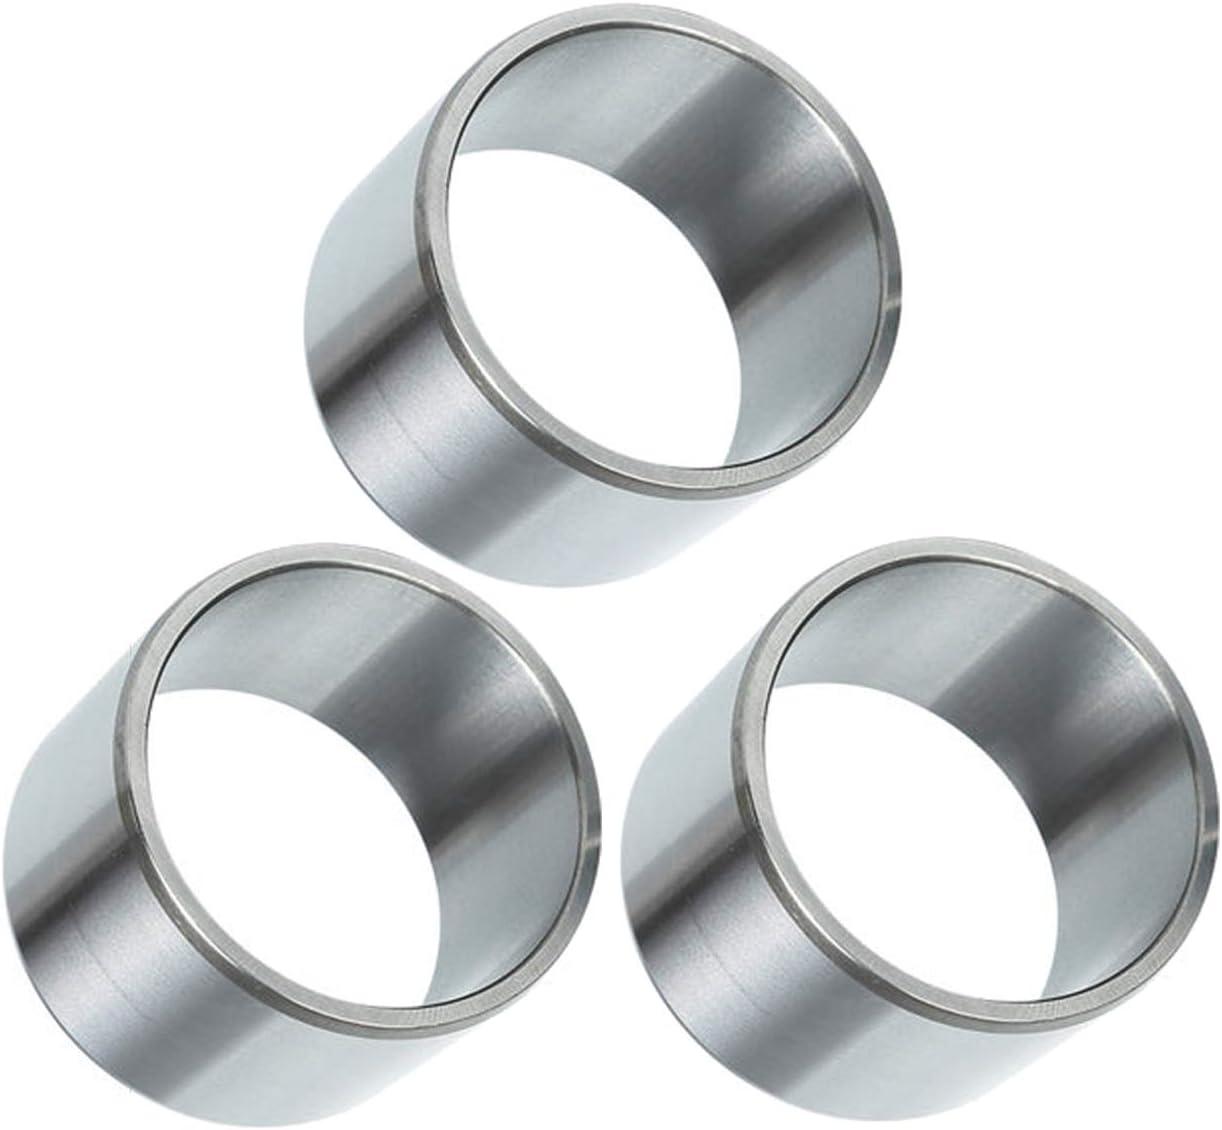 MHUI Steel Reducer Bushing Steel Spacer Bushing Adapters ID 5mm